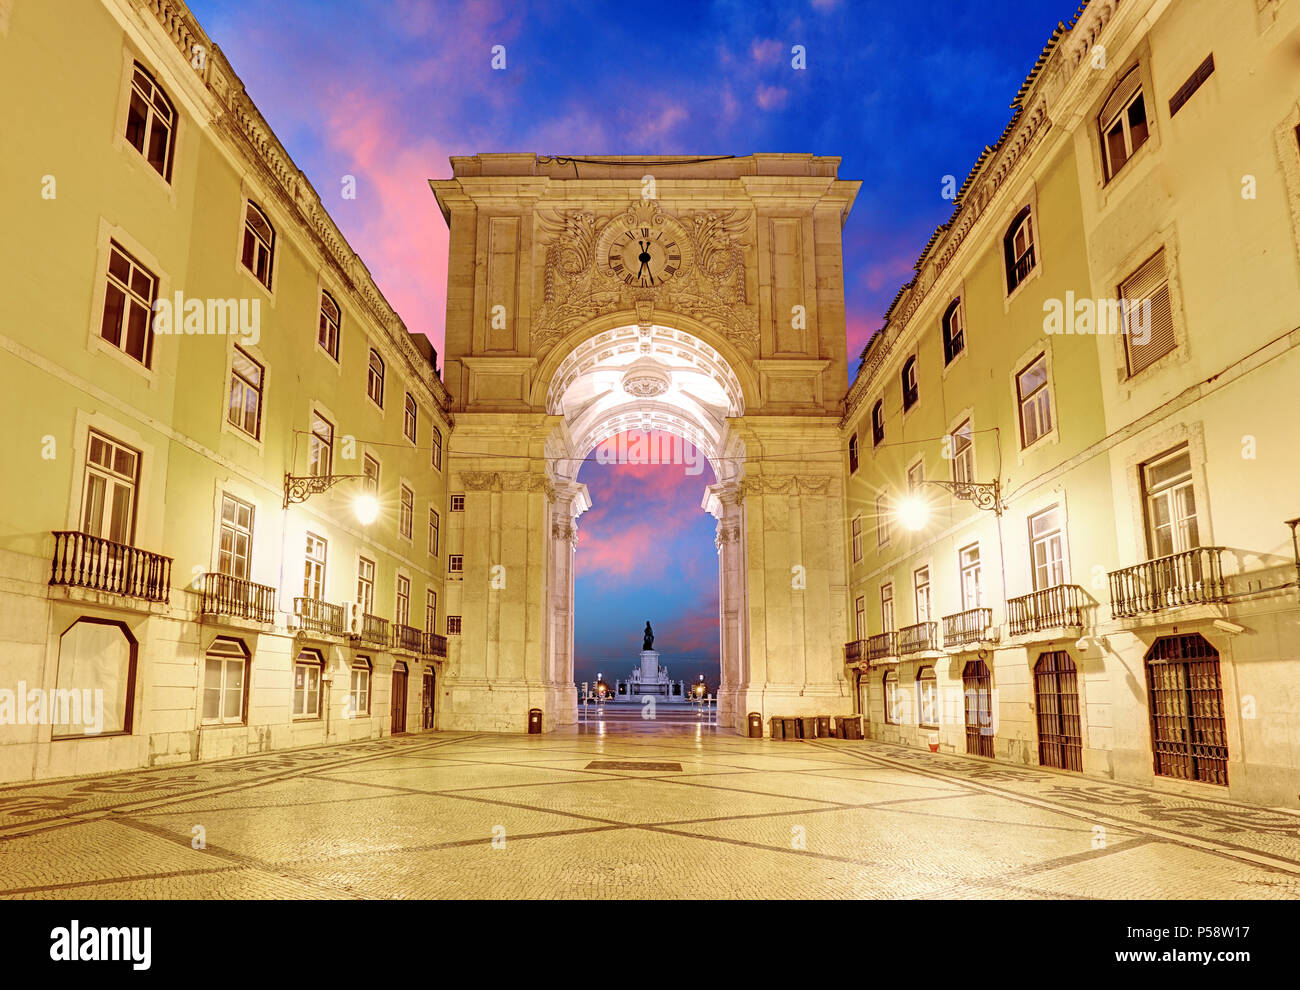 Lisbon -  Praca do Comercio, Portugal - Stock Image